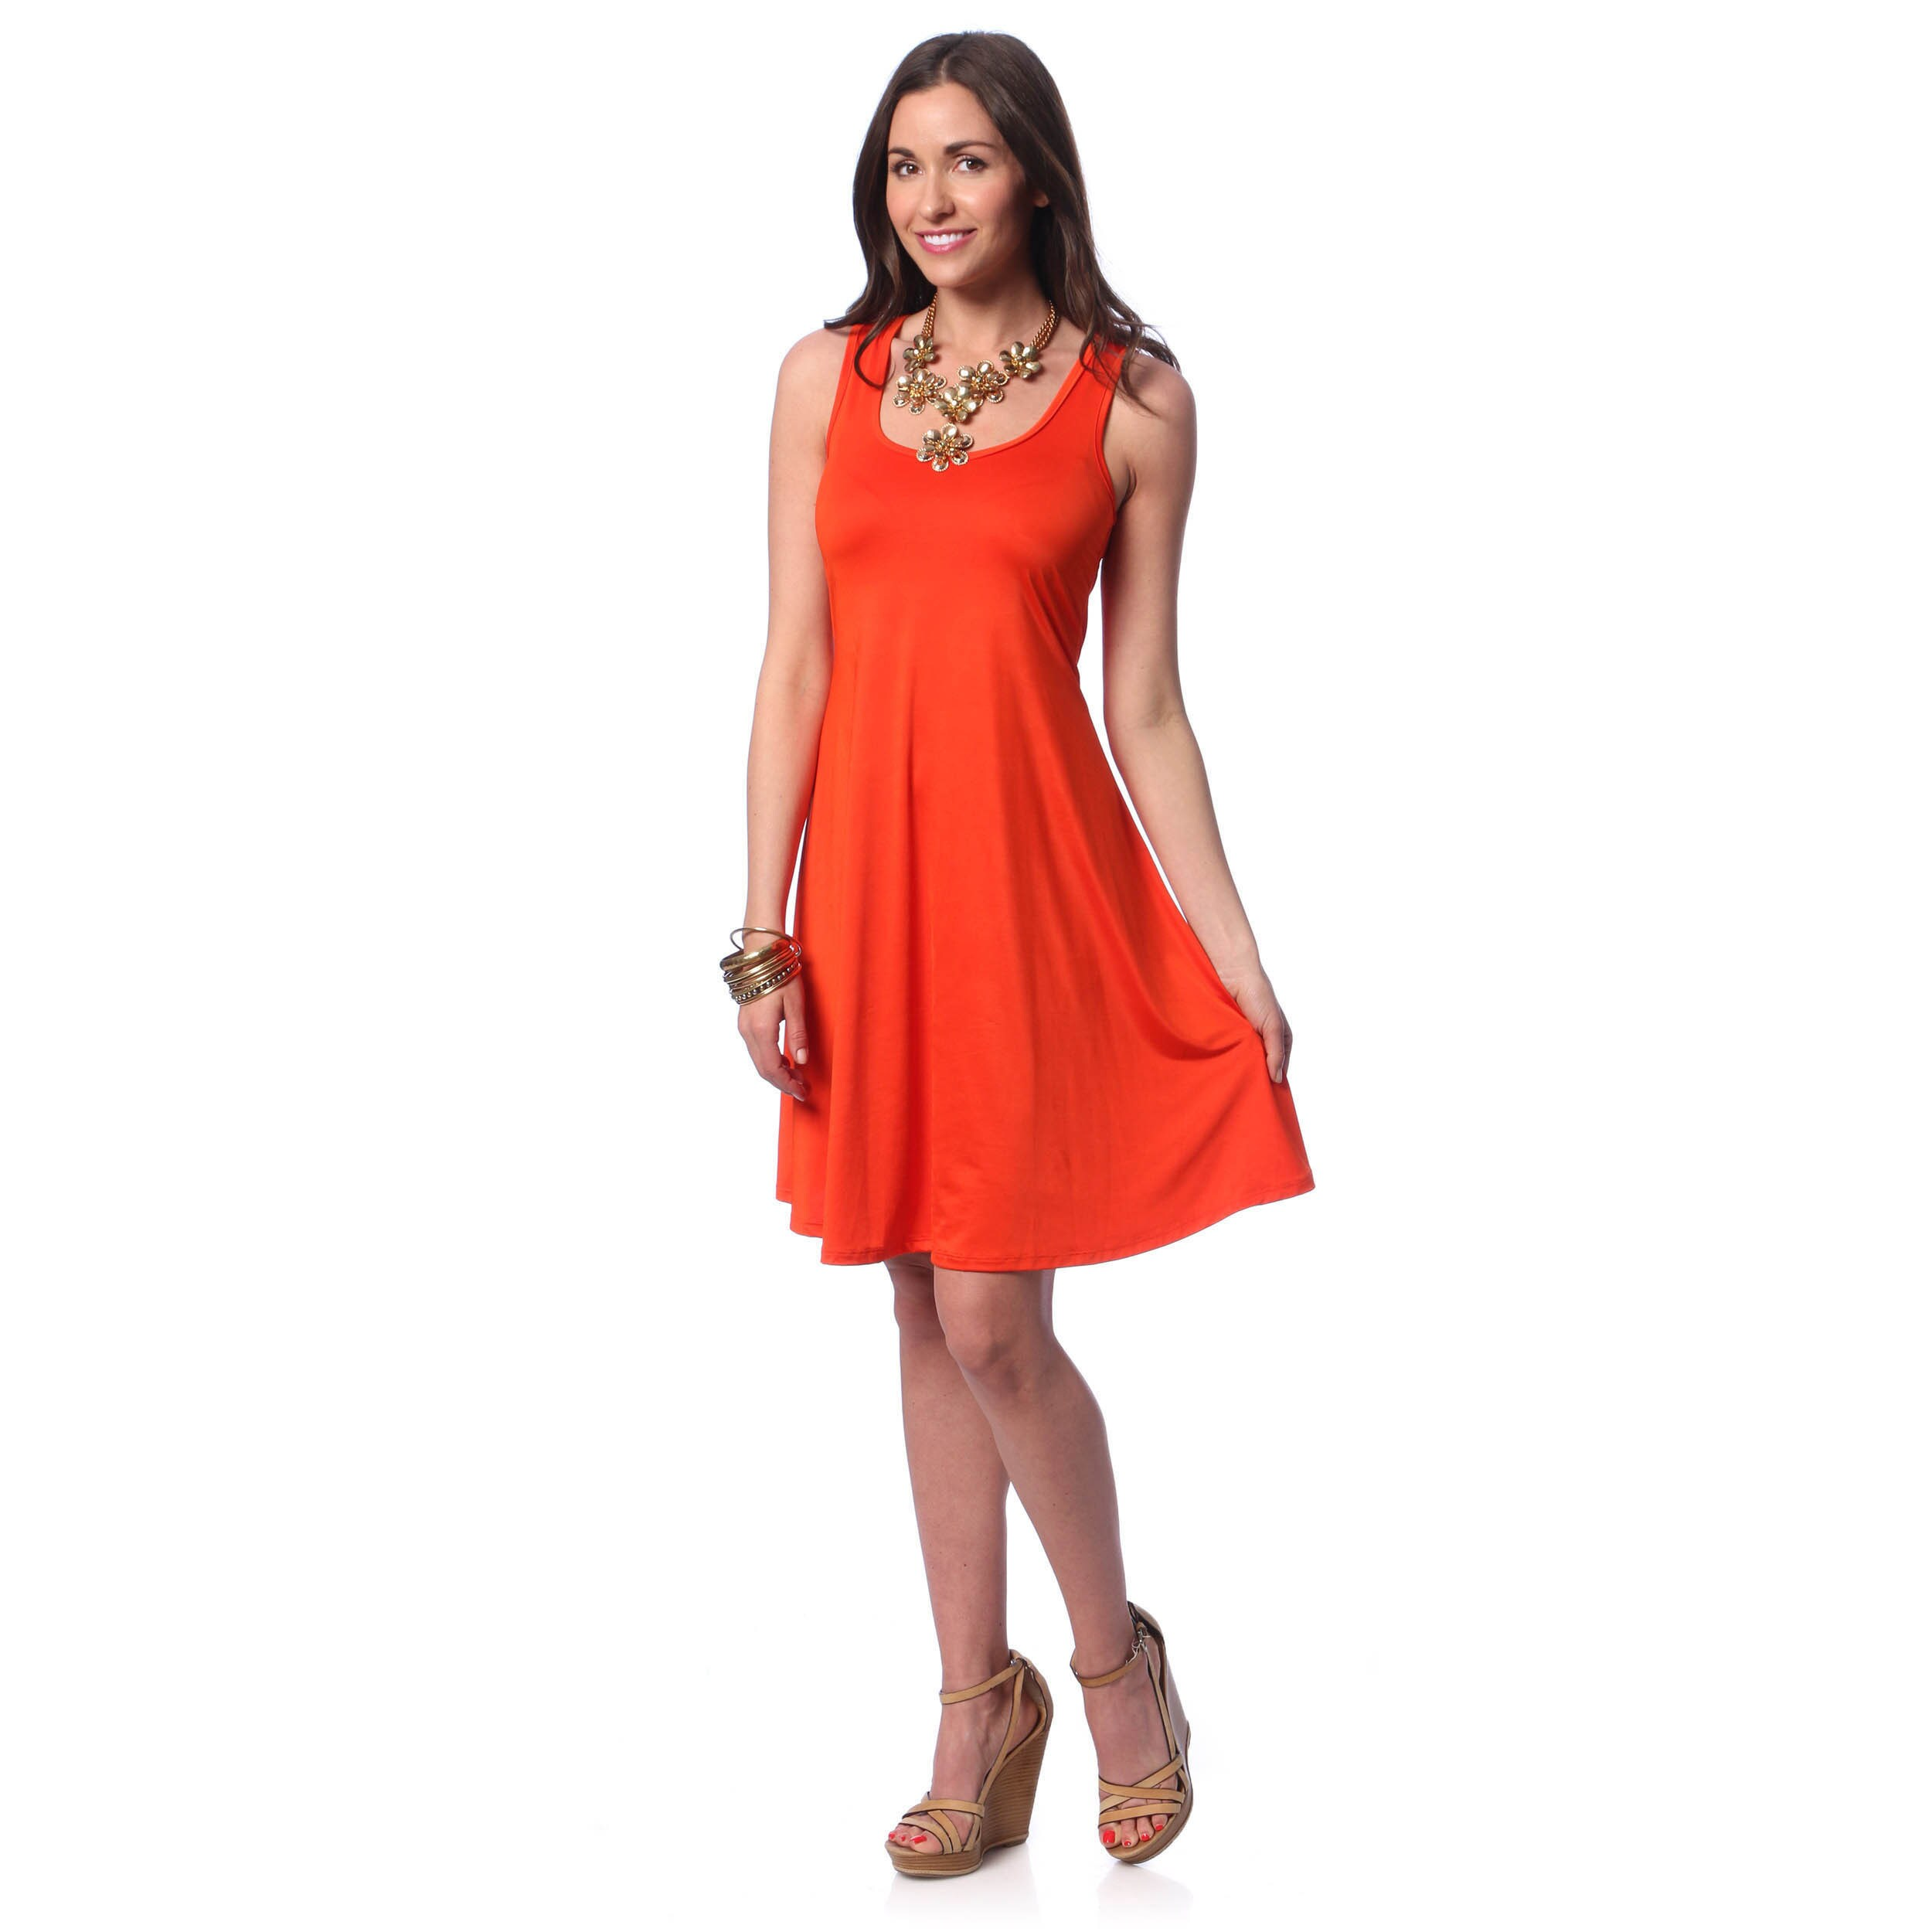 177c8302f1 Shop 24/7 Comfort Apparel Women's Solid Sleeveless Tank Dress - On ...